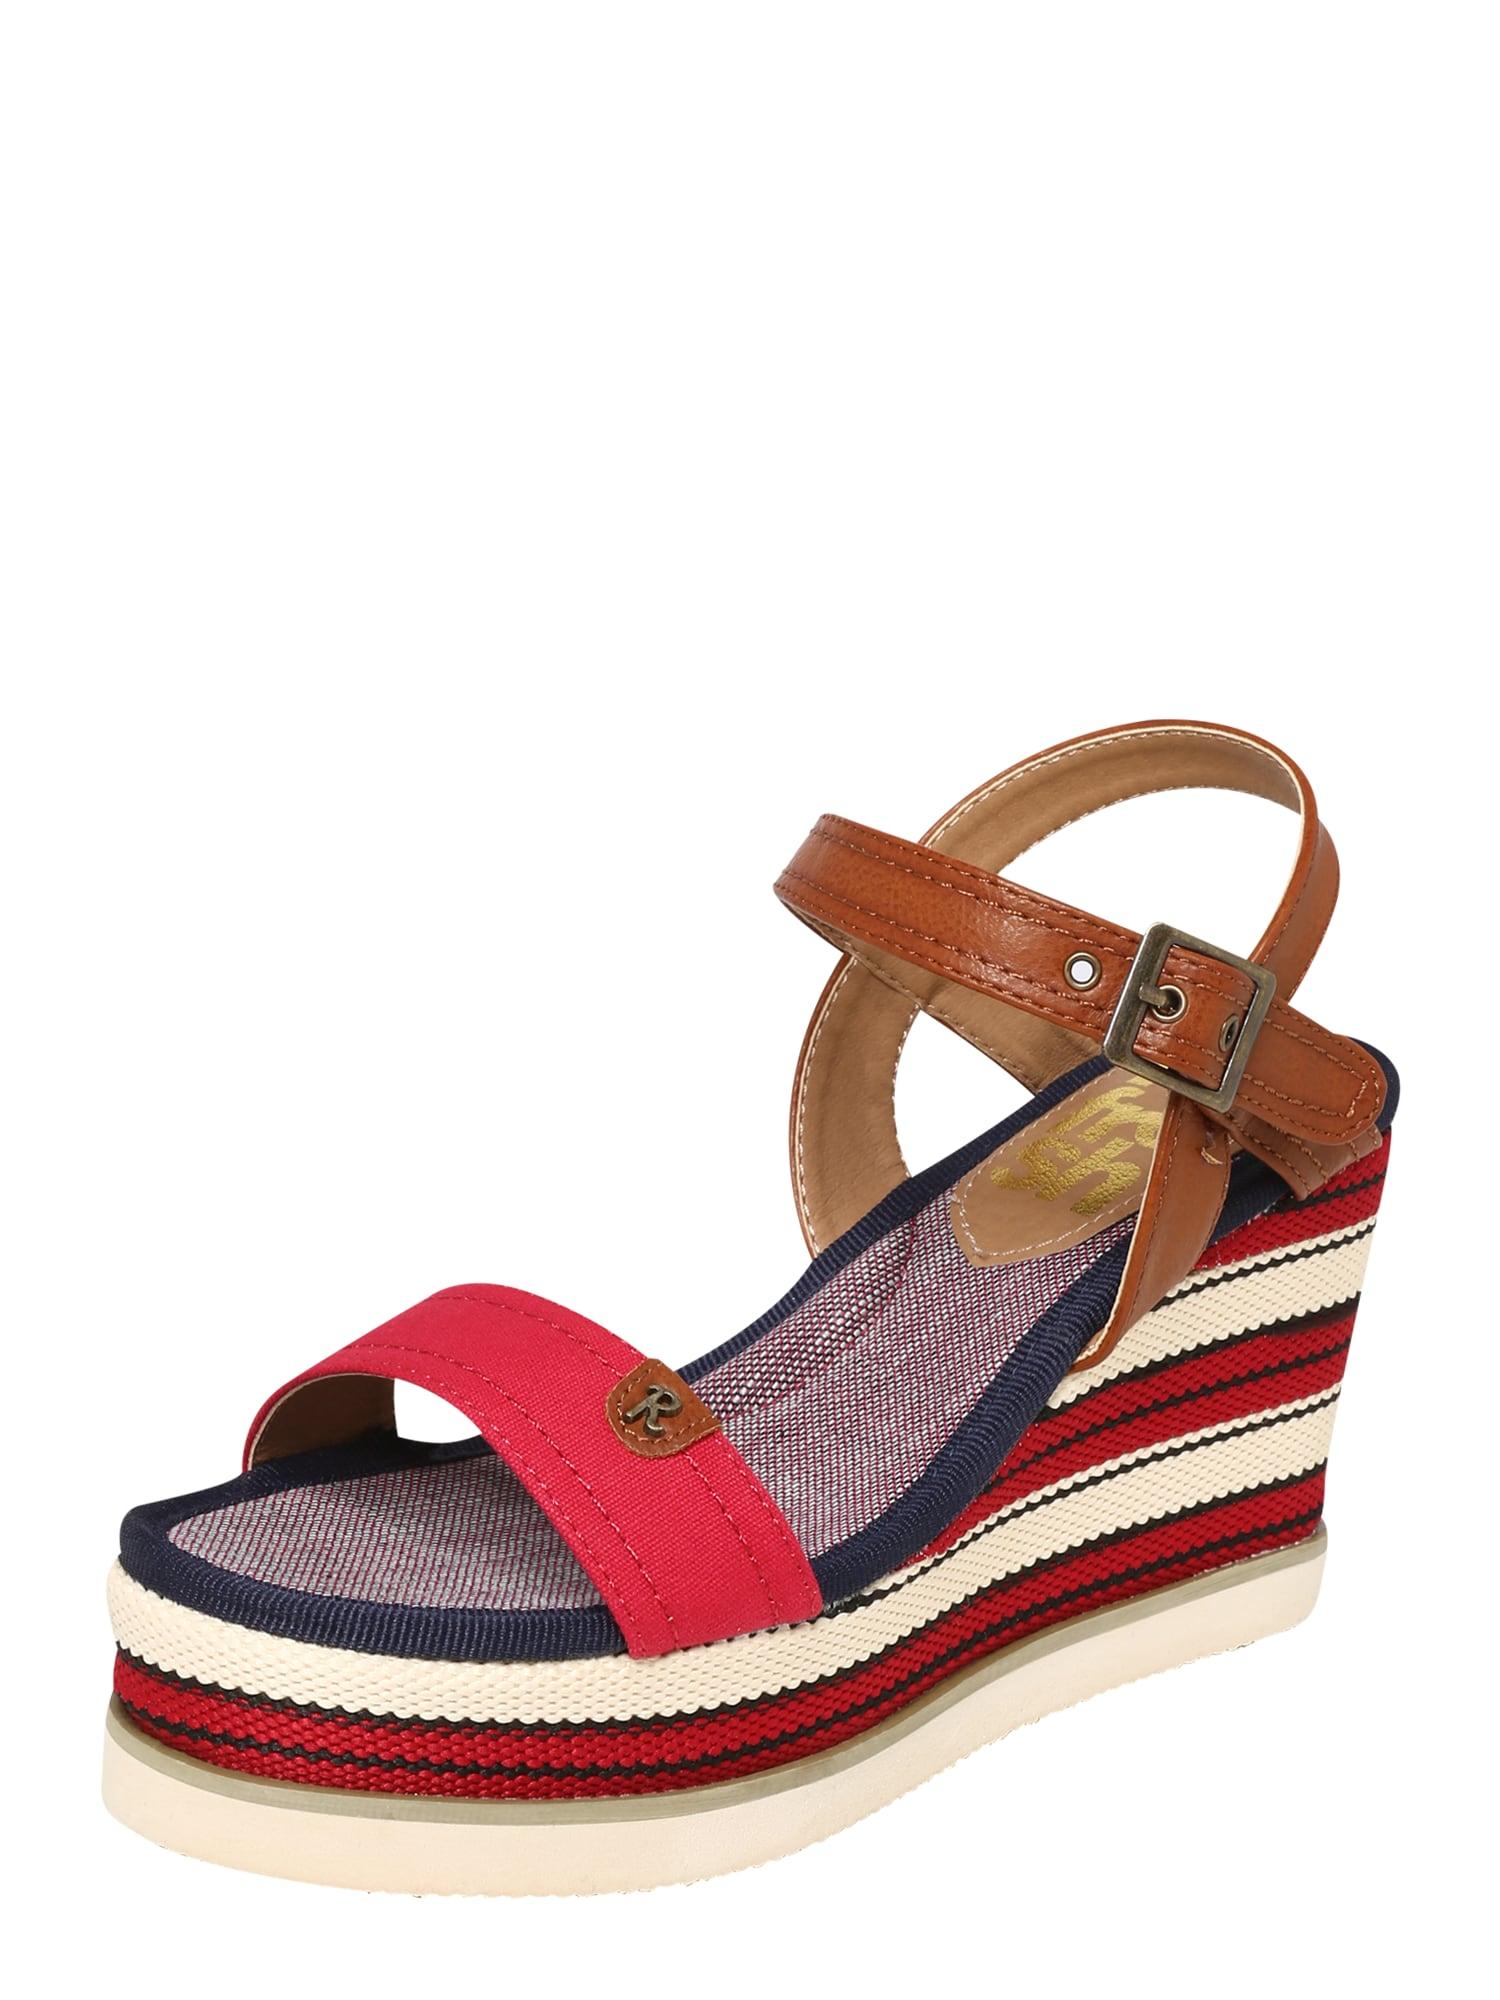 Páskové sandály béžová modrá červená Refresh